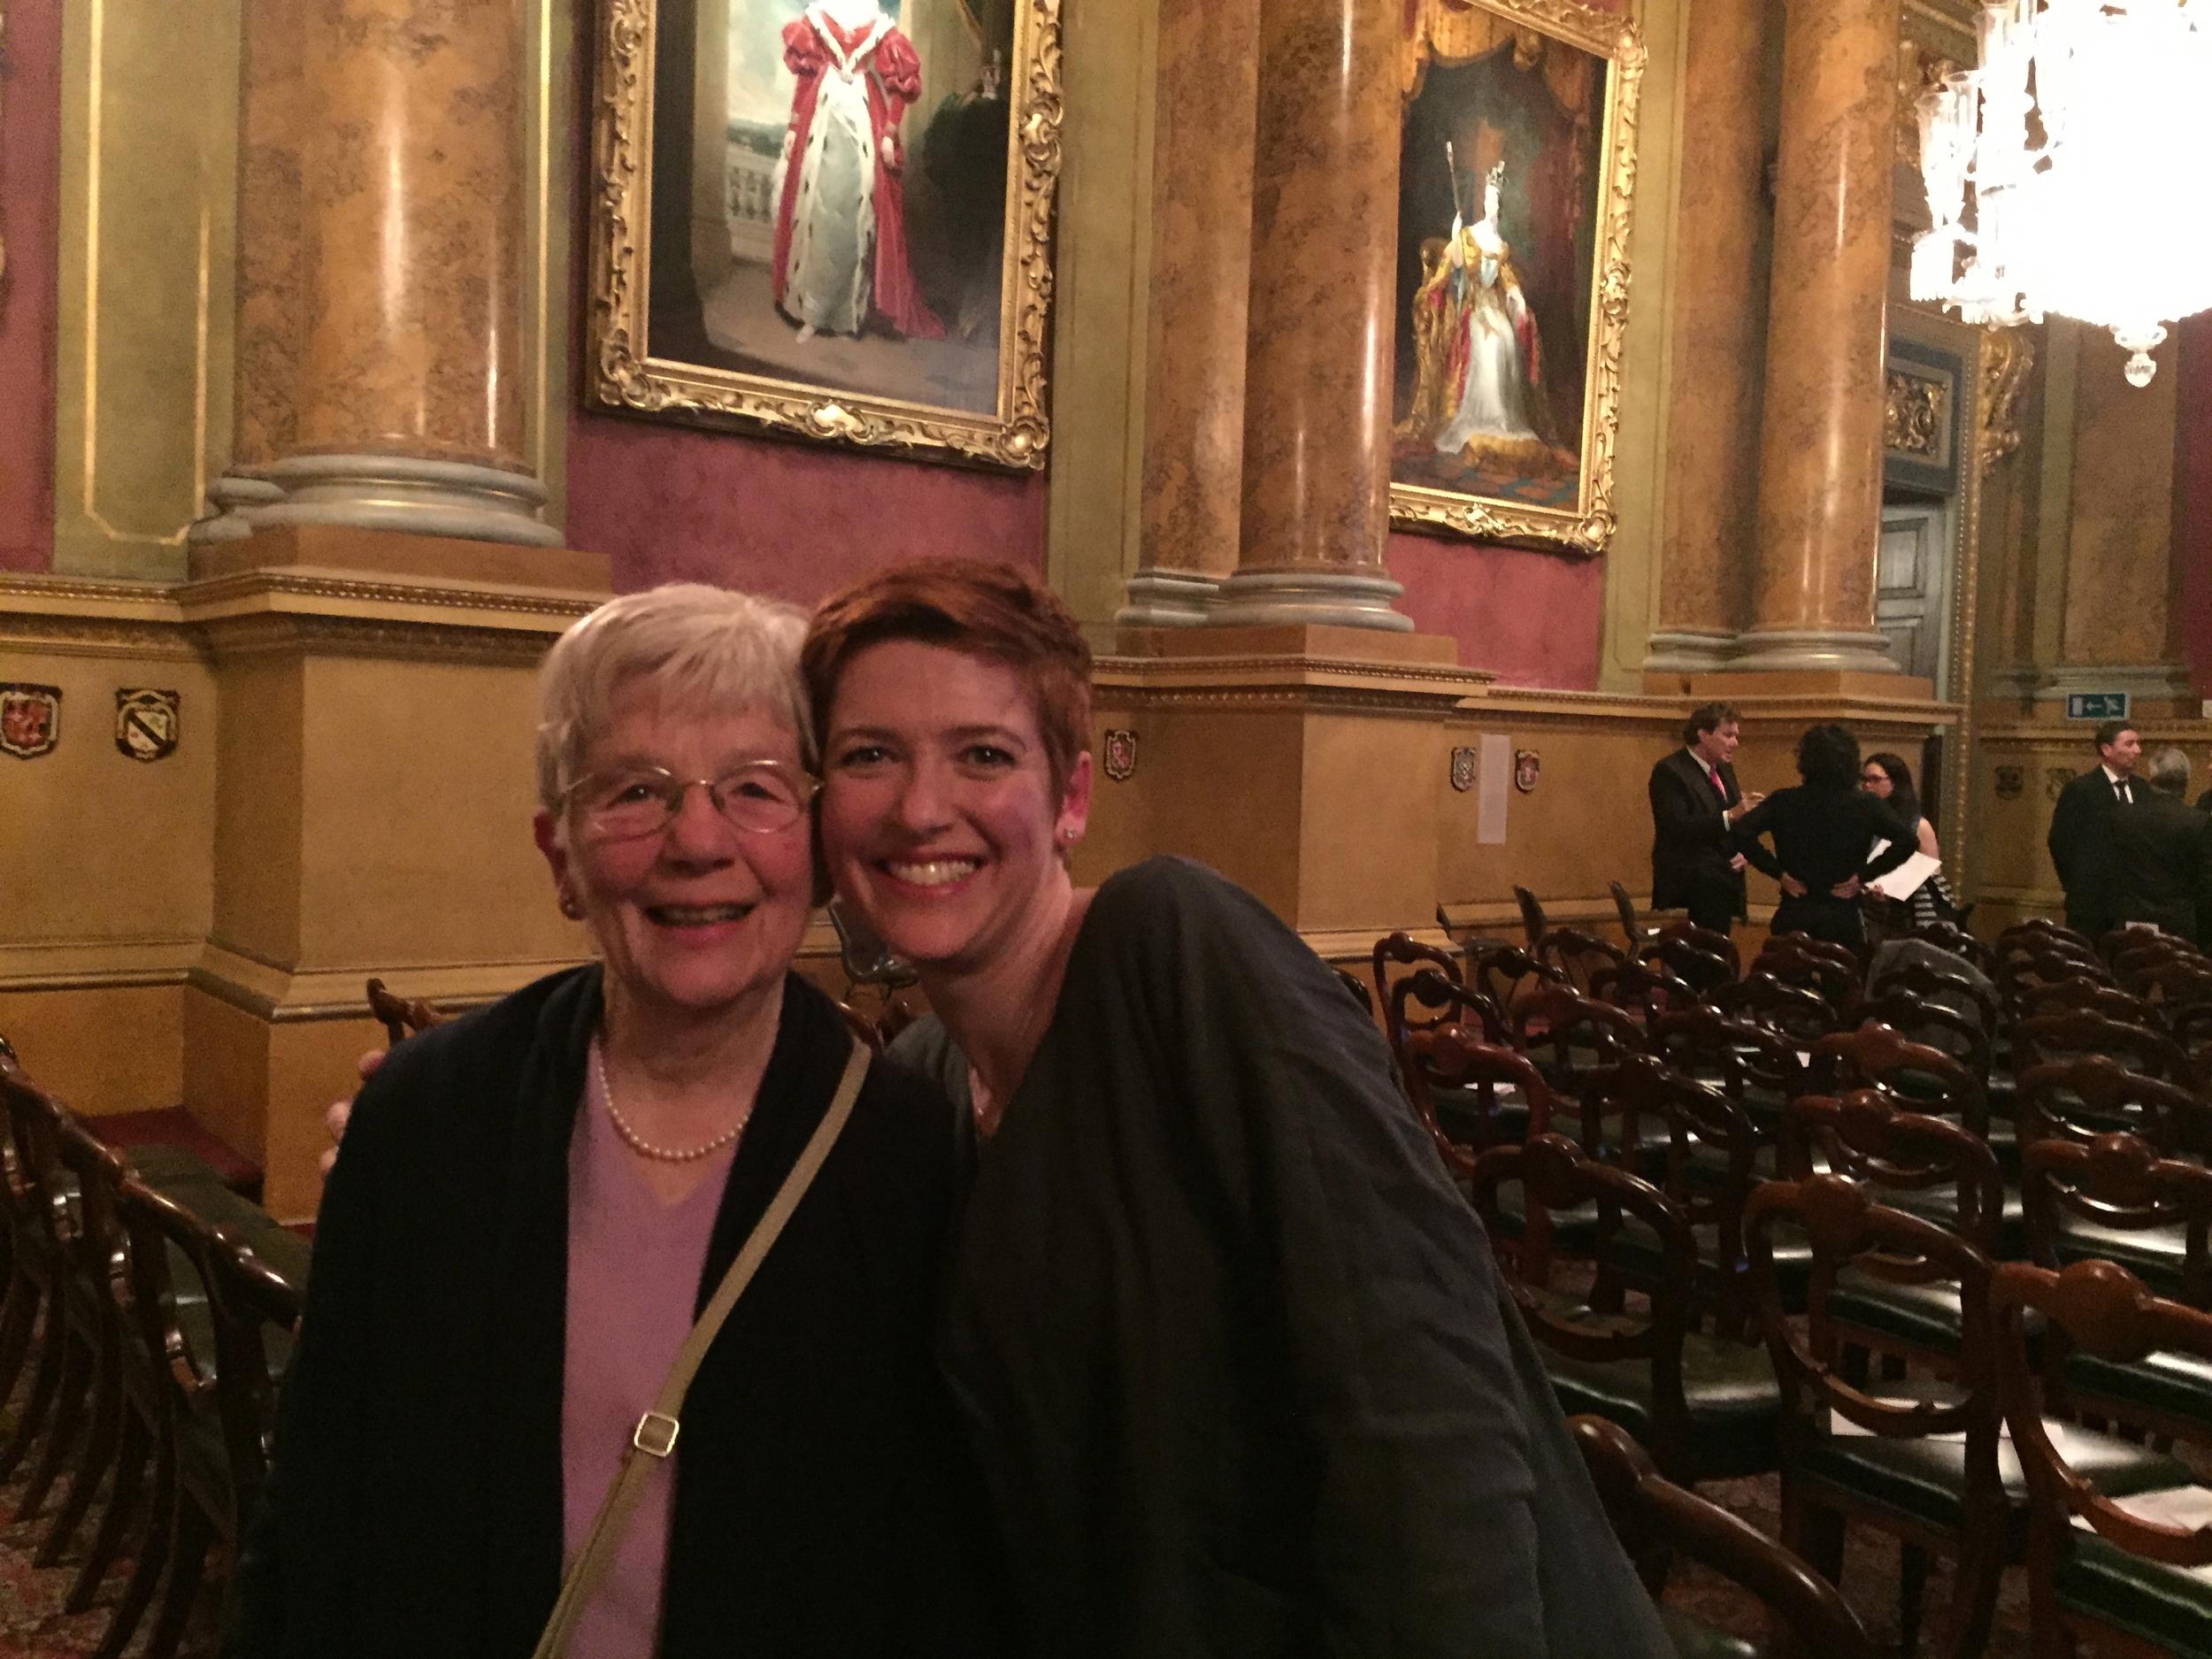 Me with my mum.